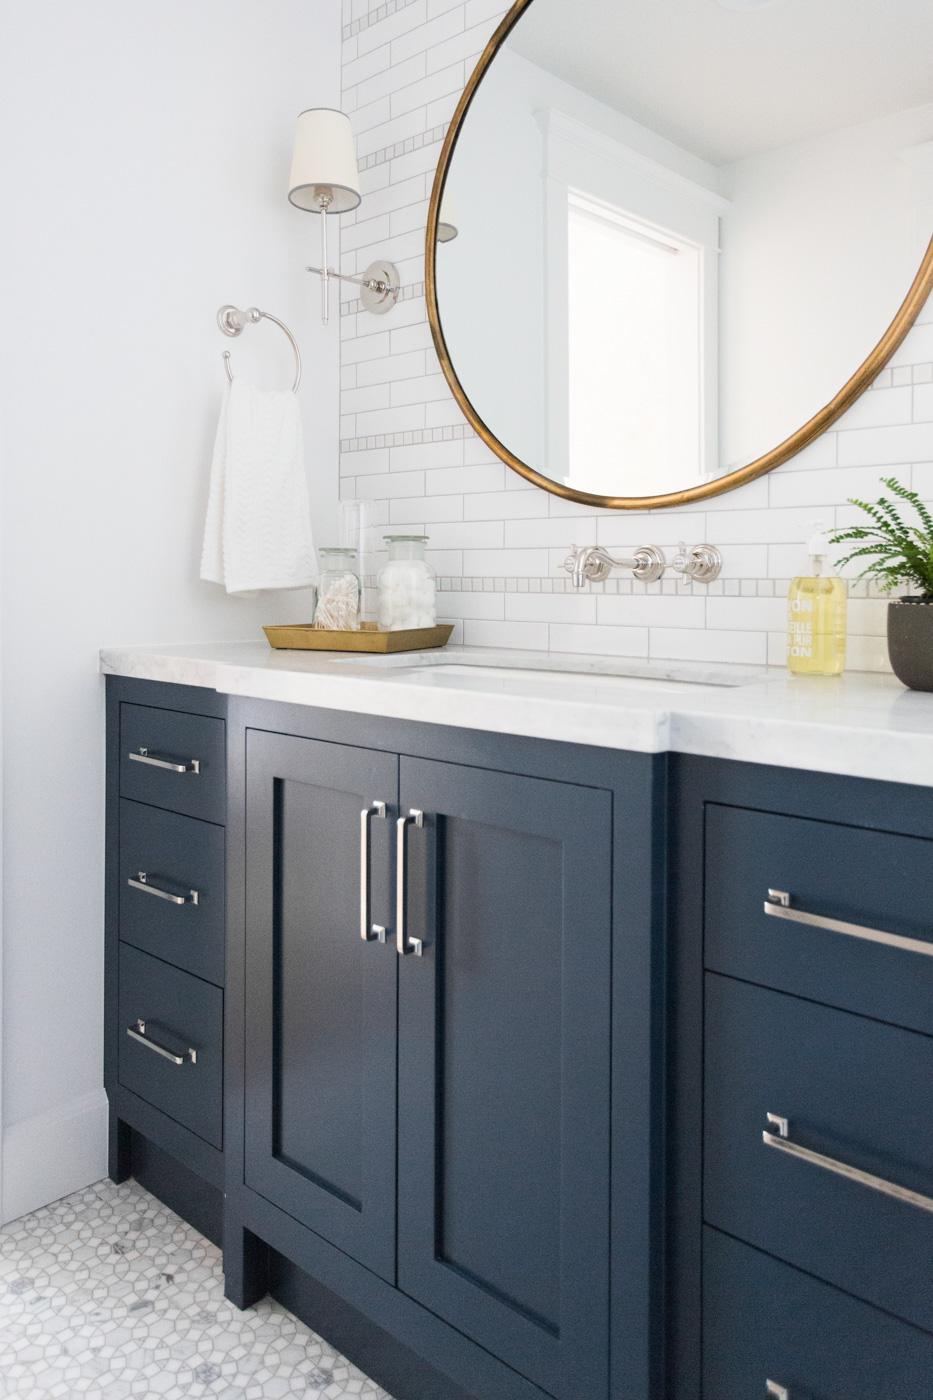 Blue cabinet details on bathroom vanity